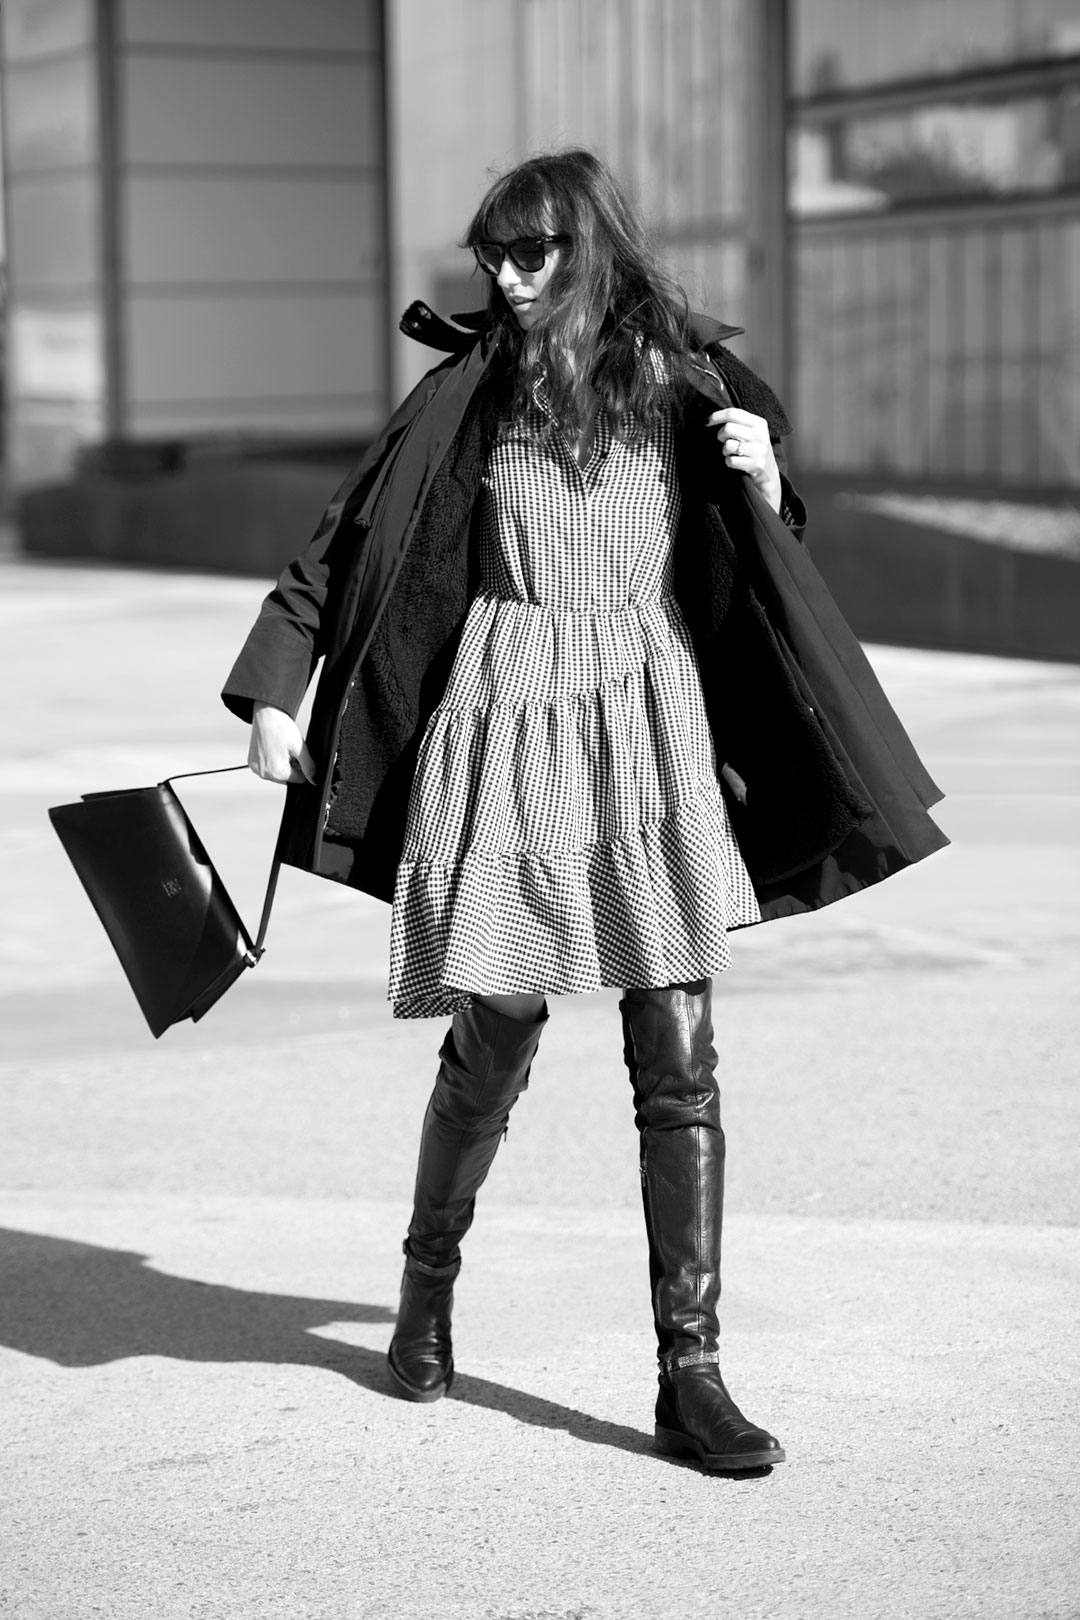 mbfwm-black-and-white-street-style-mitmeblog-bn-web-05